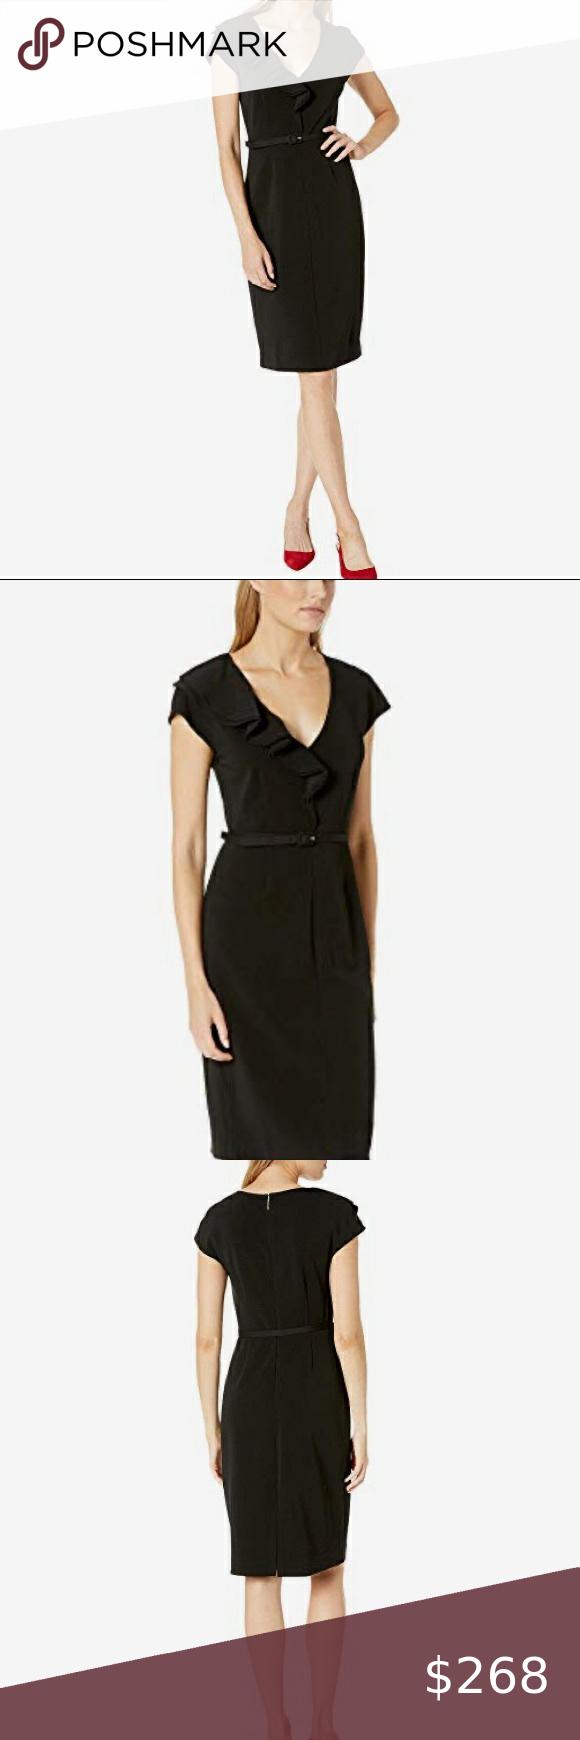 Kate Spade Must Have Little Black Dress Classic Kate Spade Little Black Dress Perfect For So Many Occasions Add A Fashion Black Dress Little Black Dress